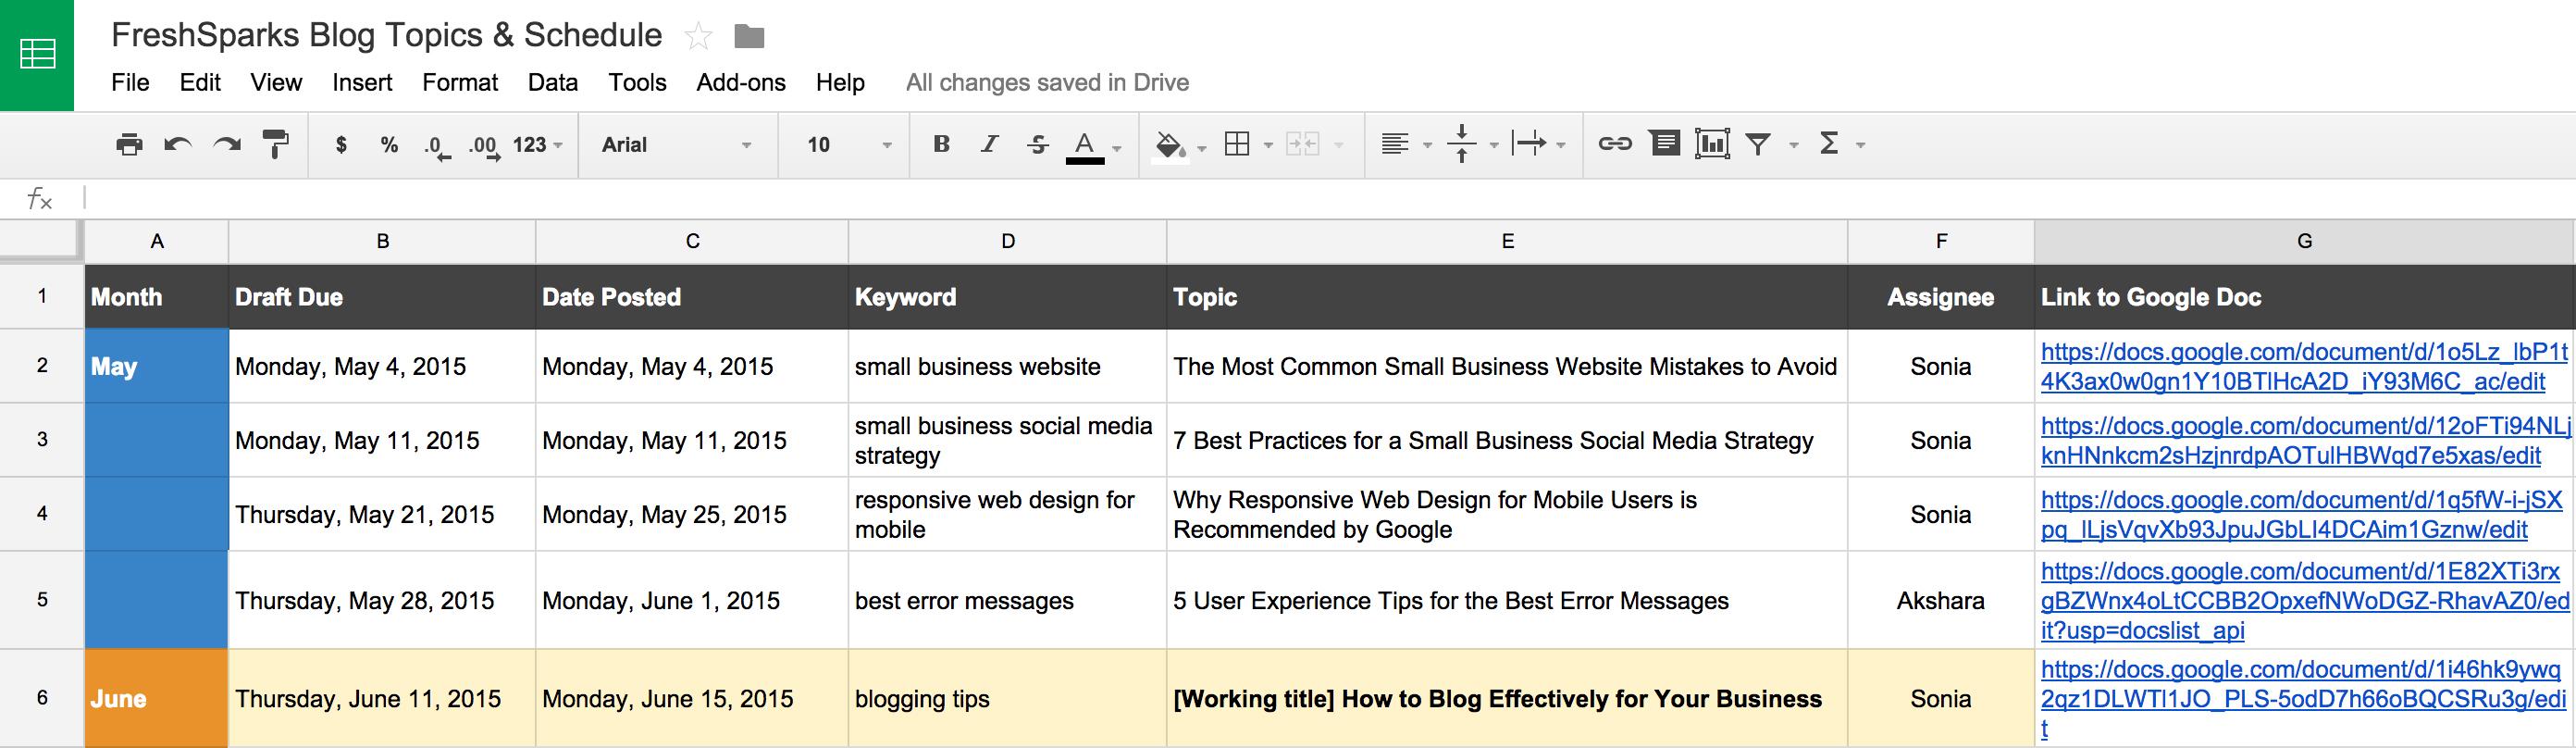 blogging tips editorial calendar